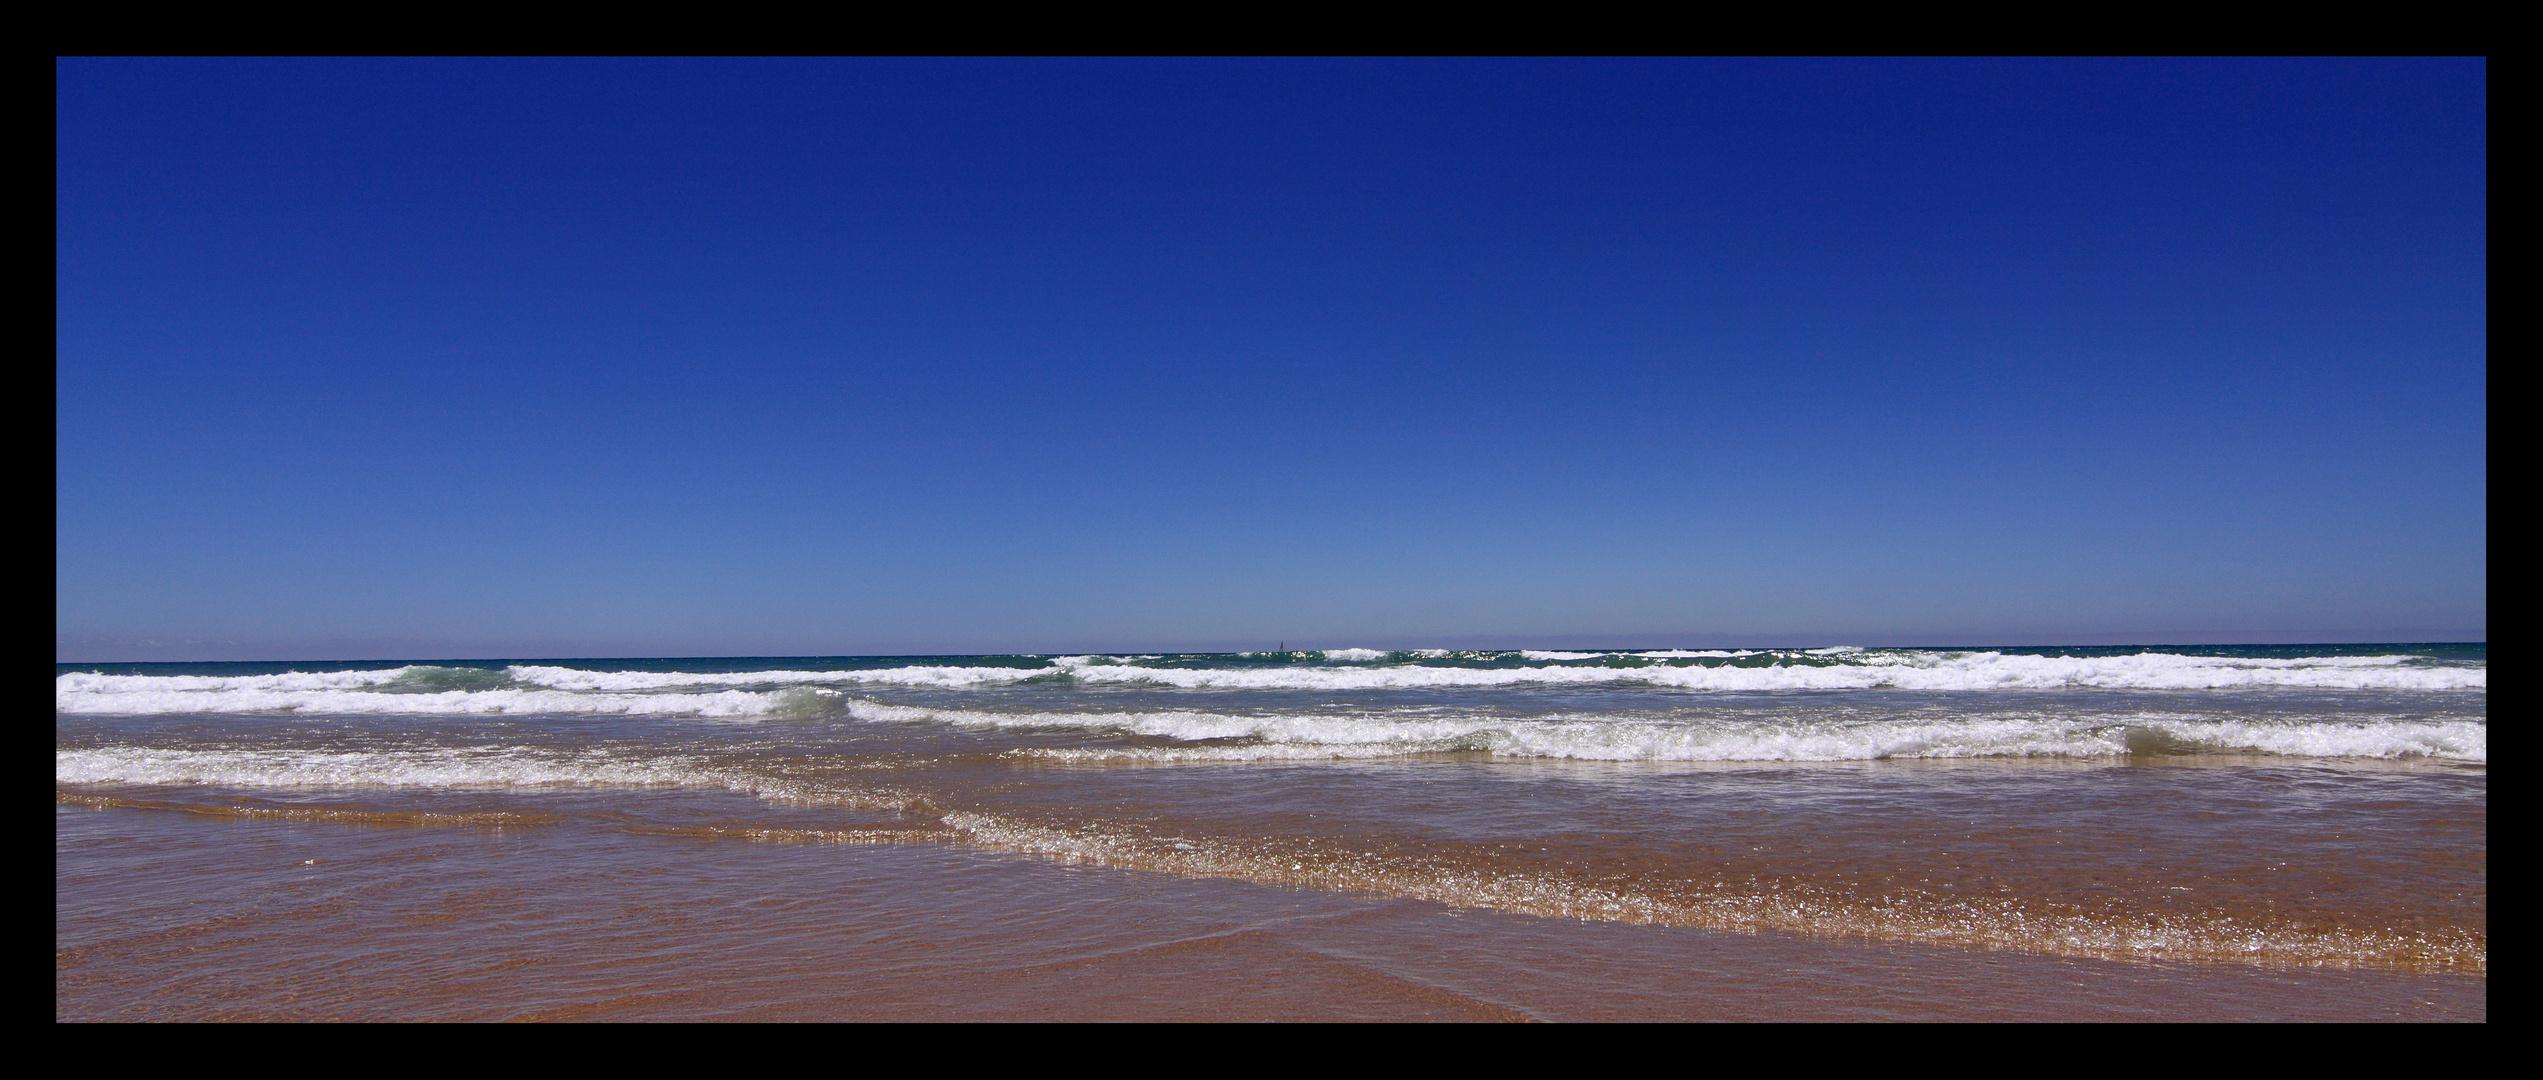 Am Playa la Barrosa ...